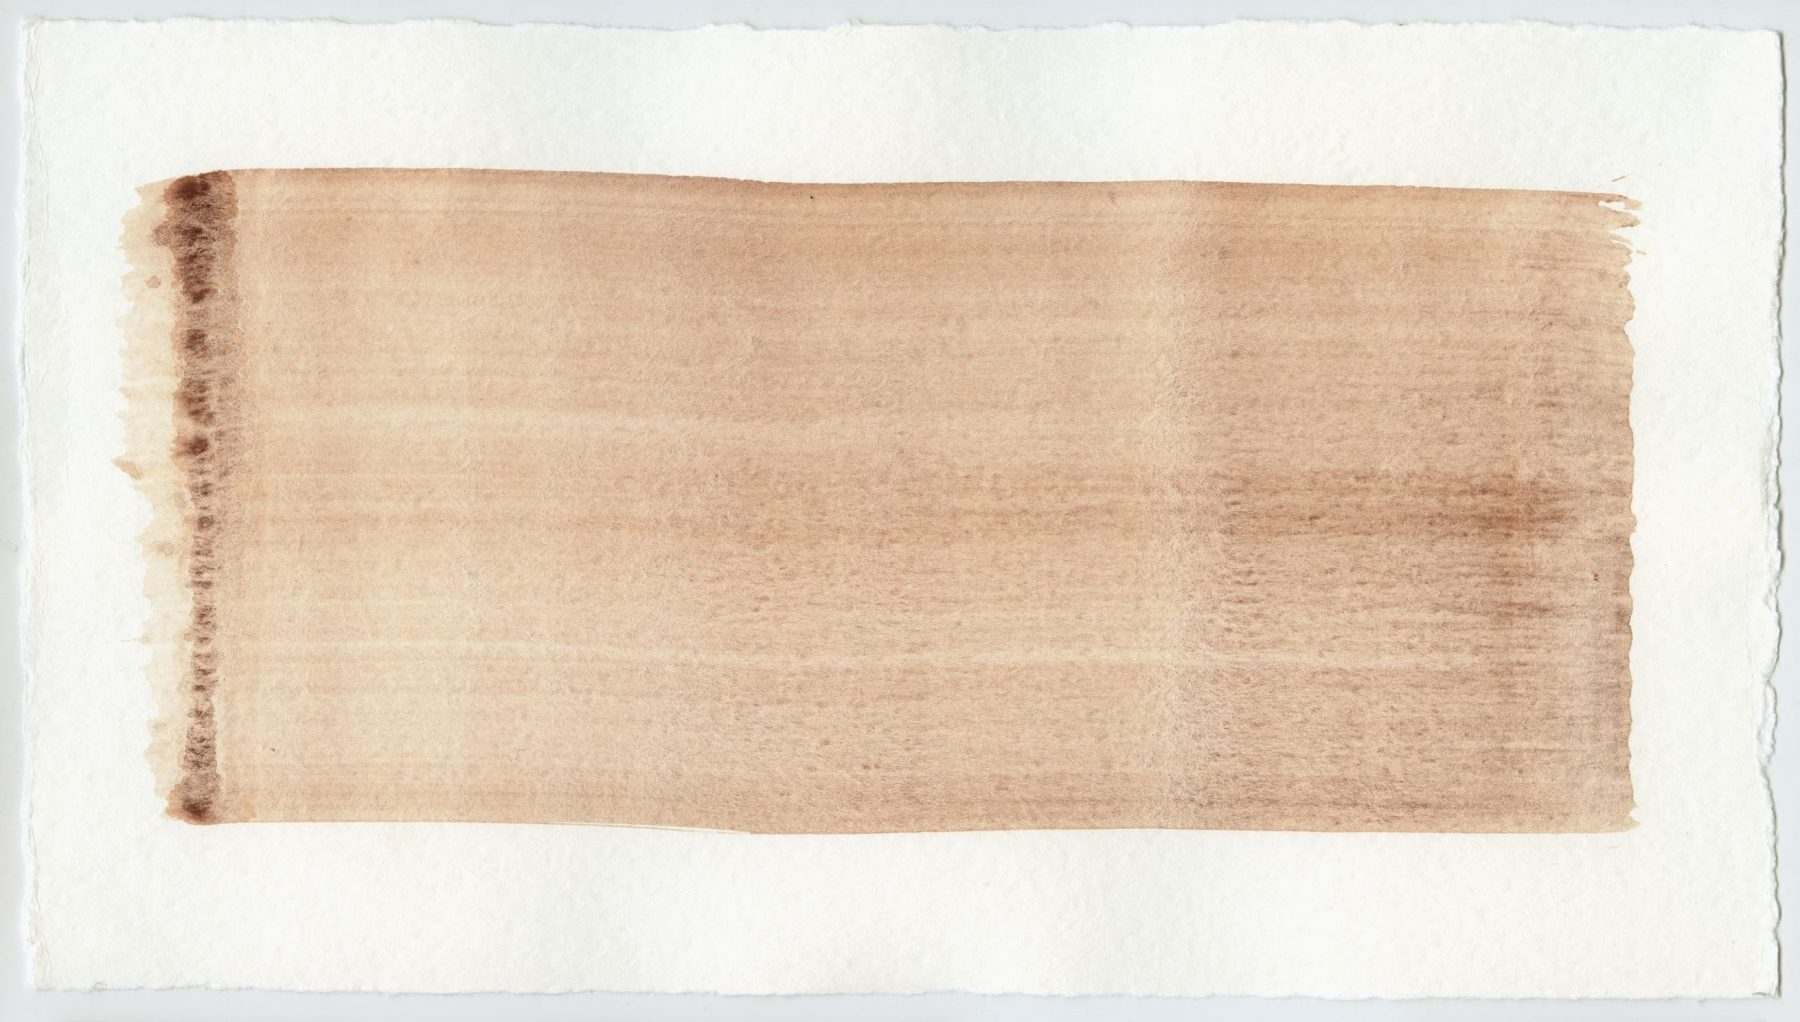 Brush stroke no. 84 - Selfmade pigment: IJzeroer gebrand